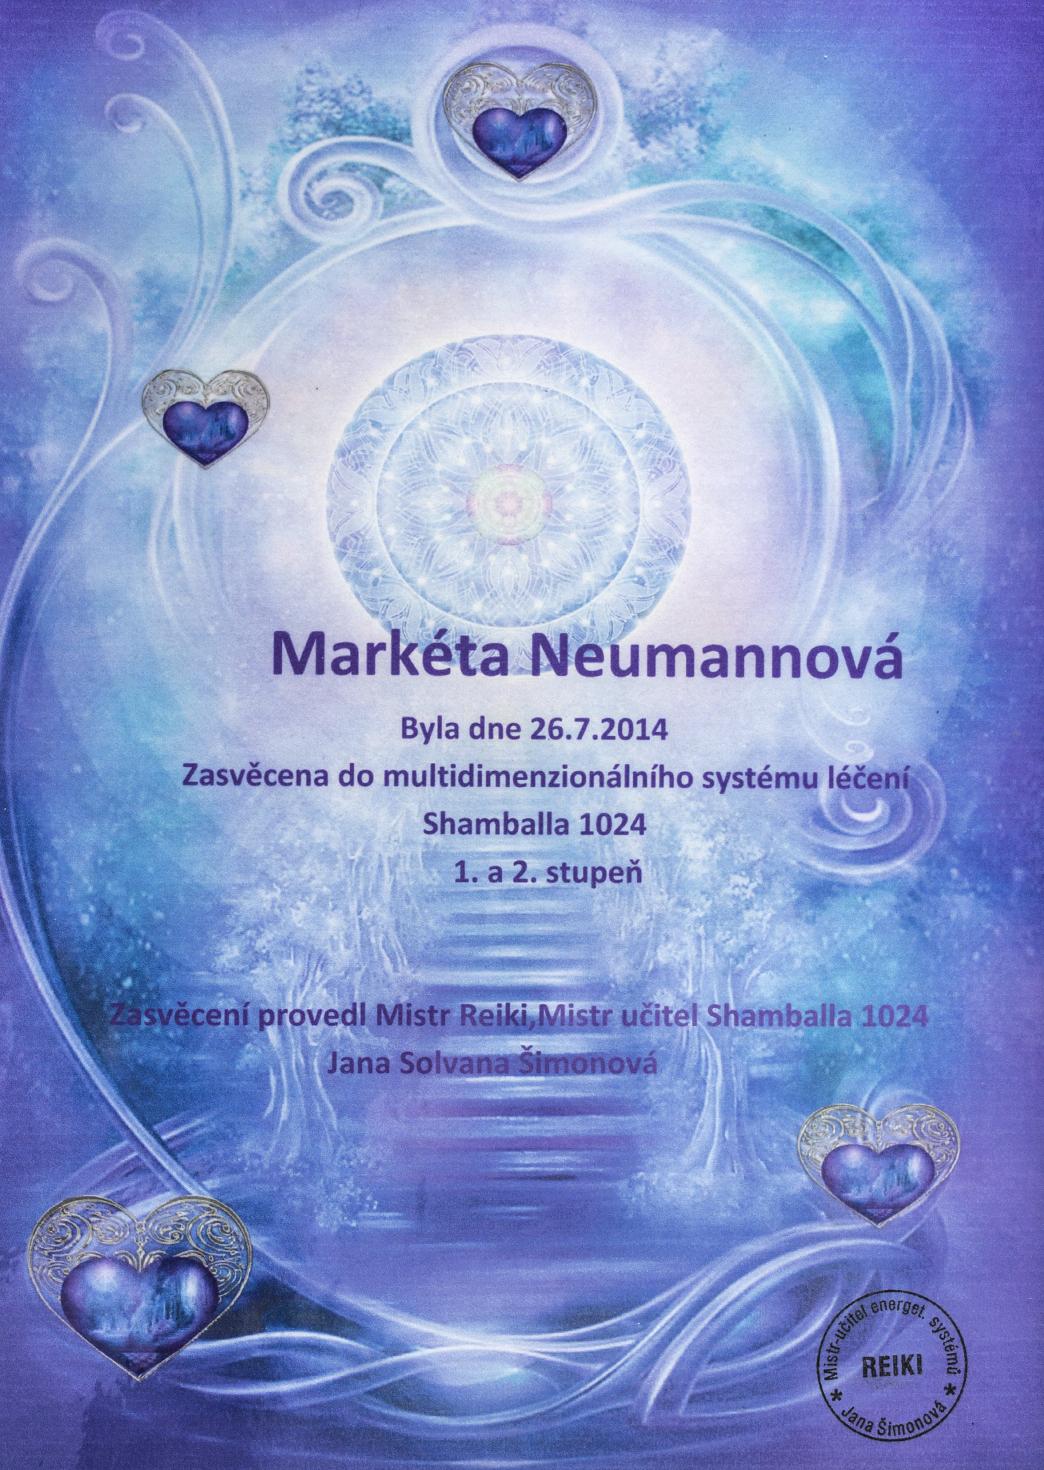 certifikaty-a-odbornosti-marketa-neumannovalecitelka-terapeutkamasazebiorezonancedetoxikacefrekvencni-terapie-benatky-nad-jizerouzasveceni-do-systemu-shamballa-1024